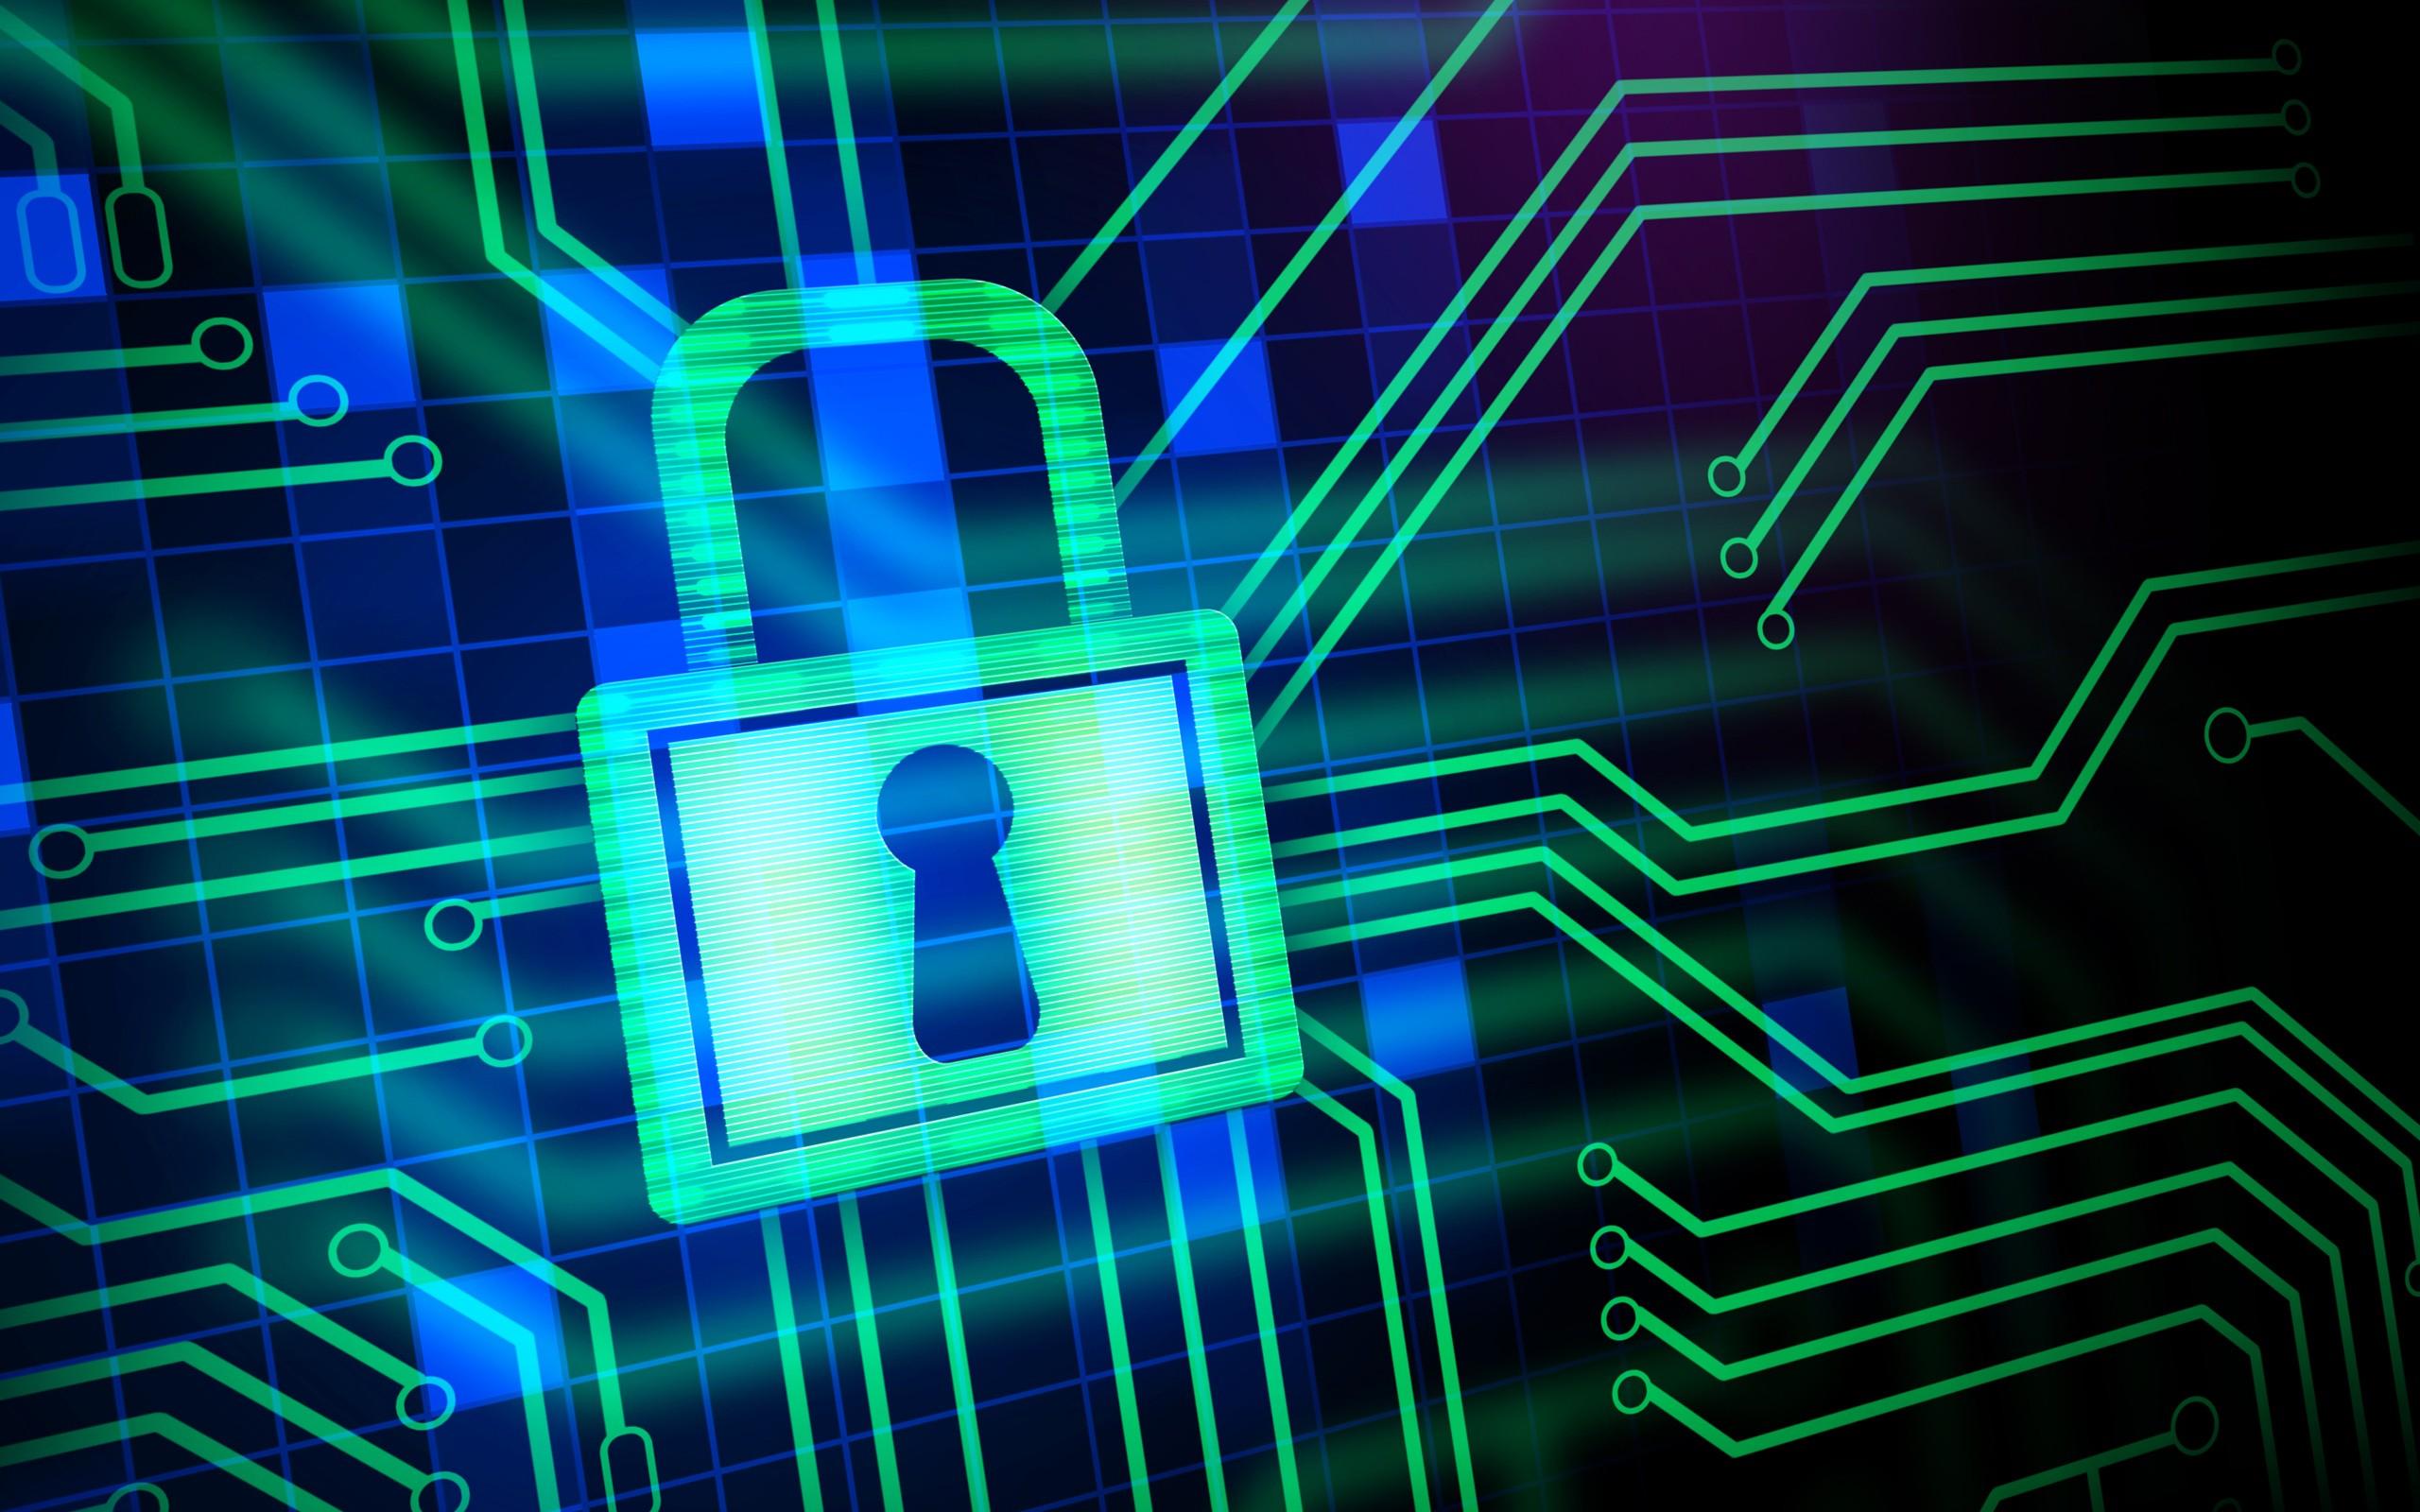 Wallpaper Neon Green Technology Padlock Laser Electricity